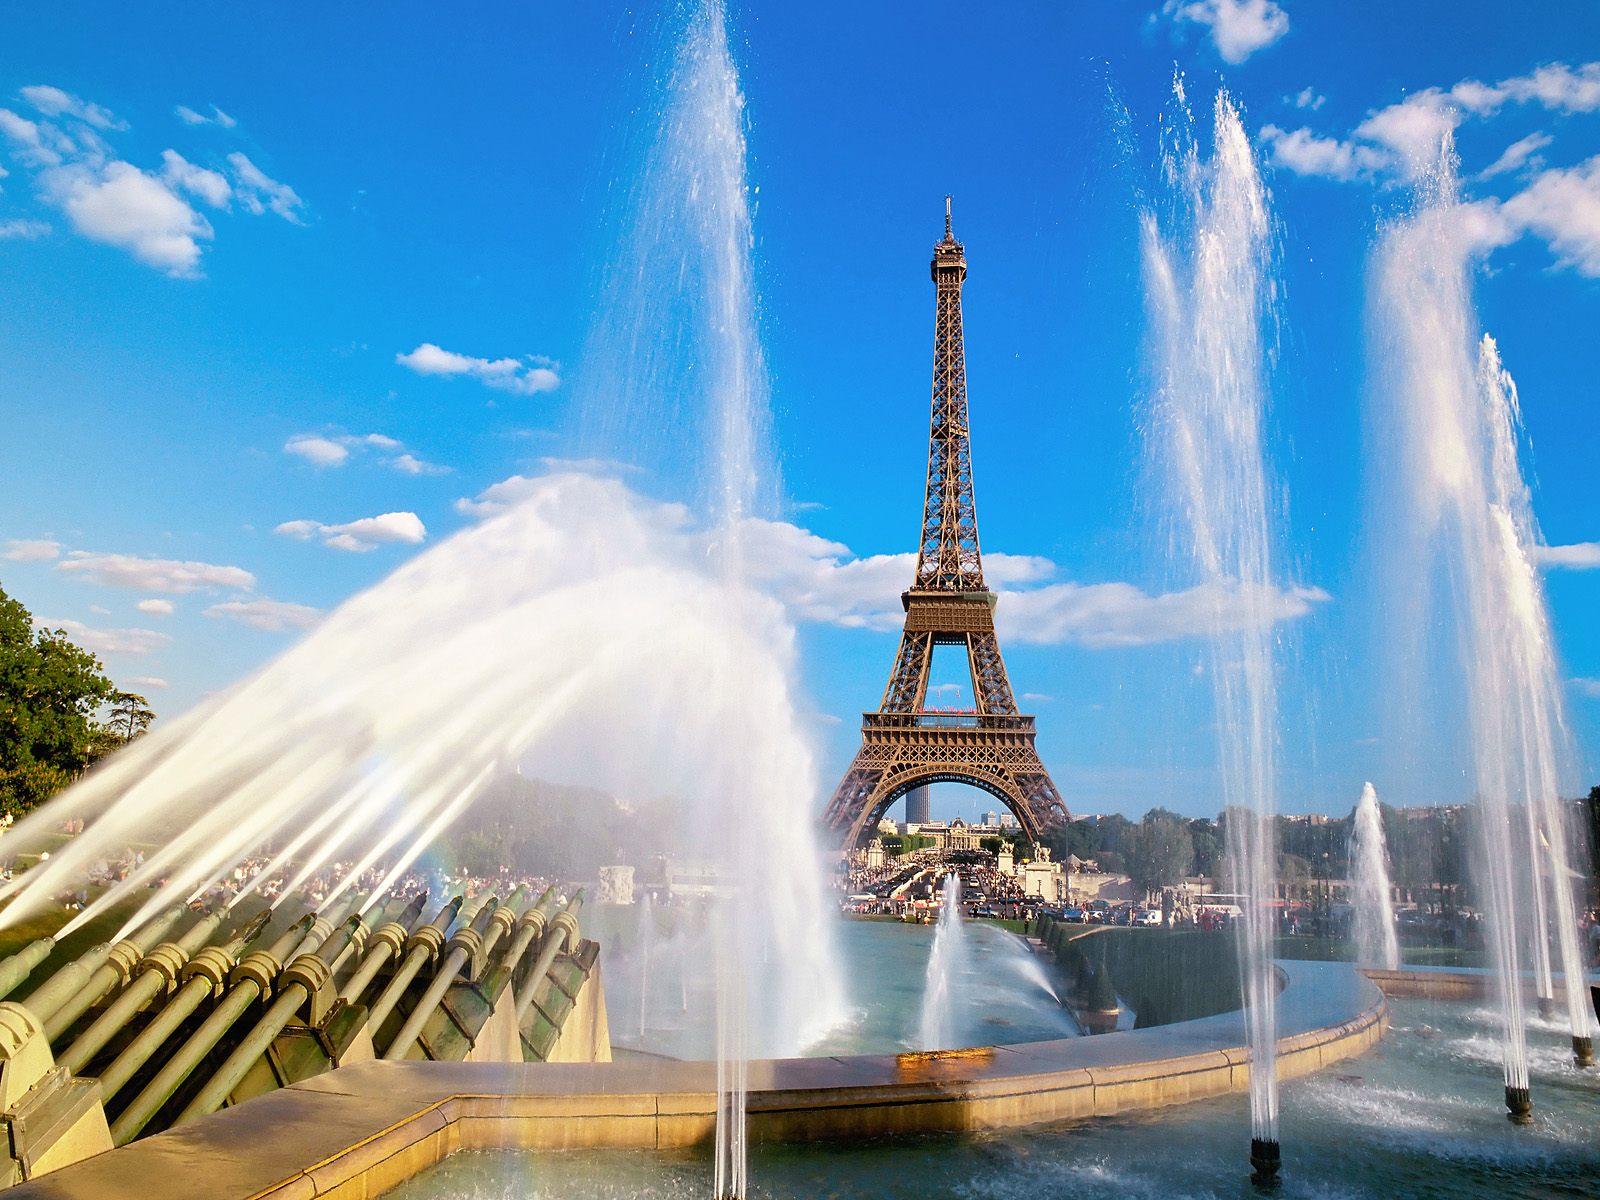 http://4.bp.blogspot.com/_WOWQJUlRtKQ/TRzGdFrDPbI/AAAAAAAABTc/fZzcfGvMr7Y/s1600/paris+eiffel+tower+3.jpg